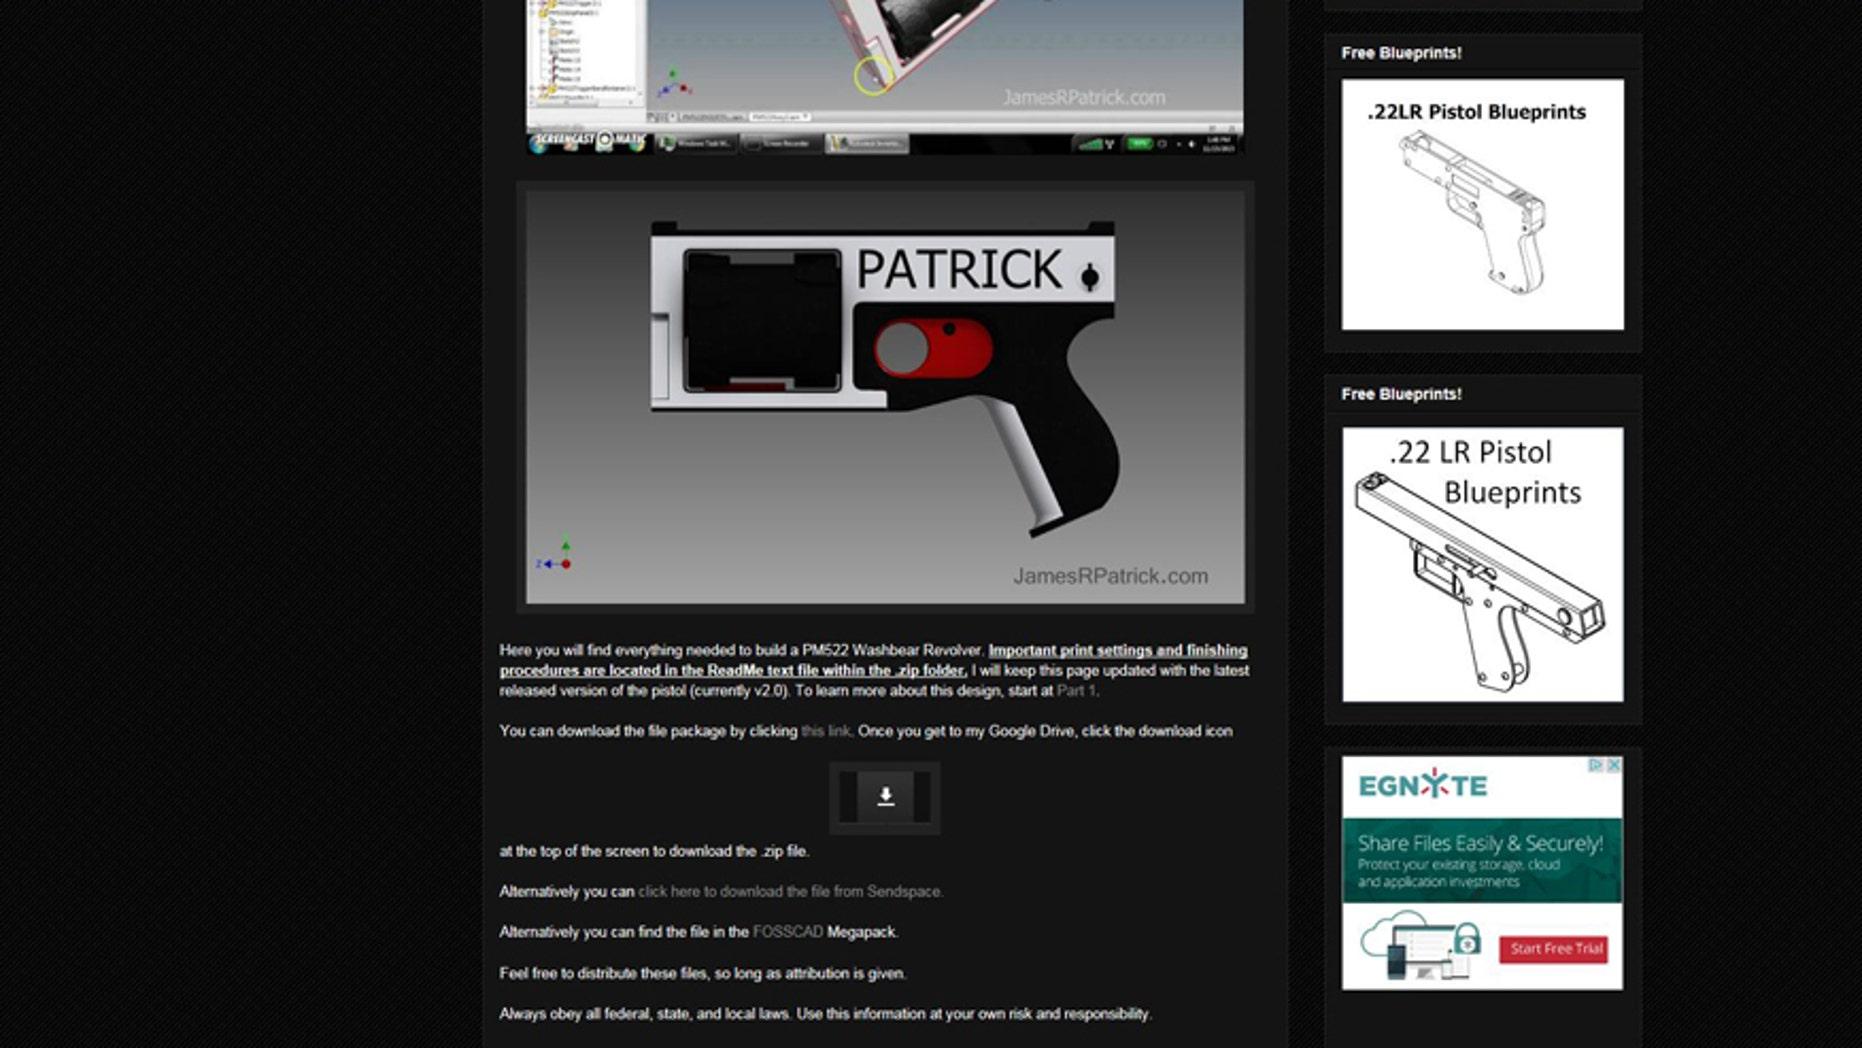 (Screenshot from www.jamesrpatrick.com)